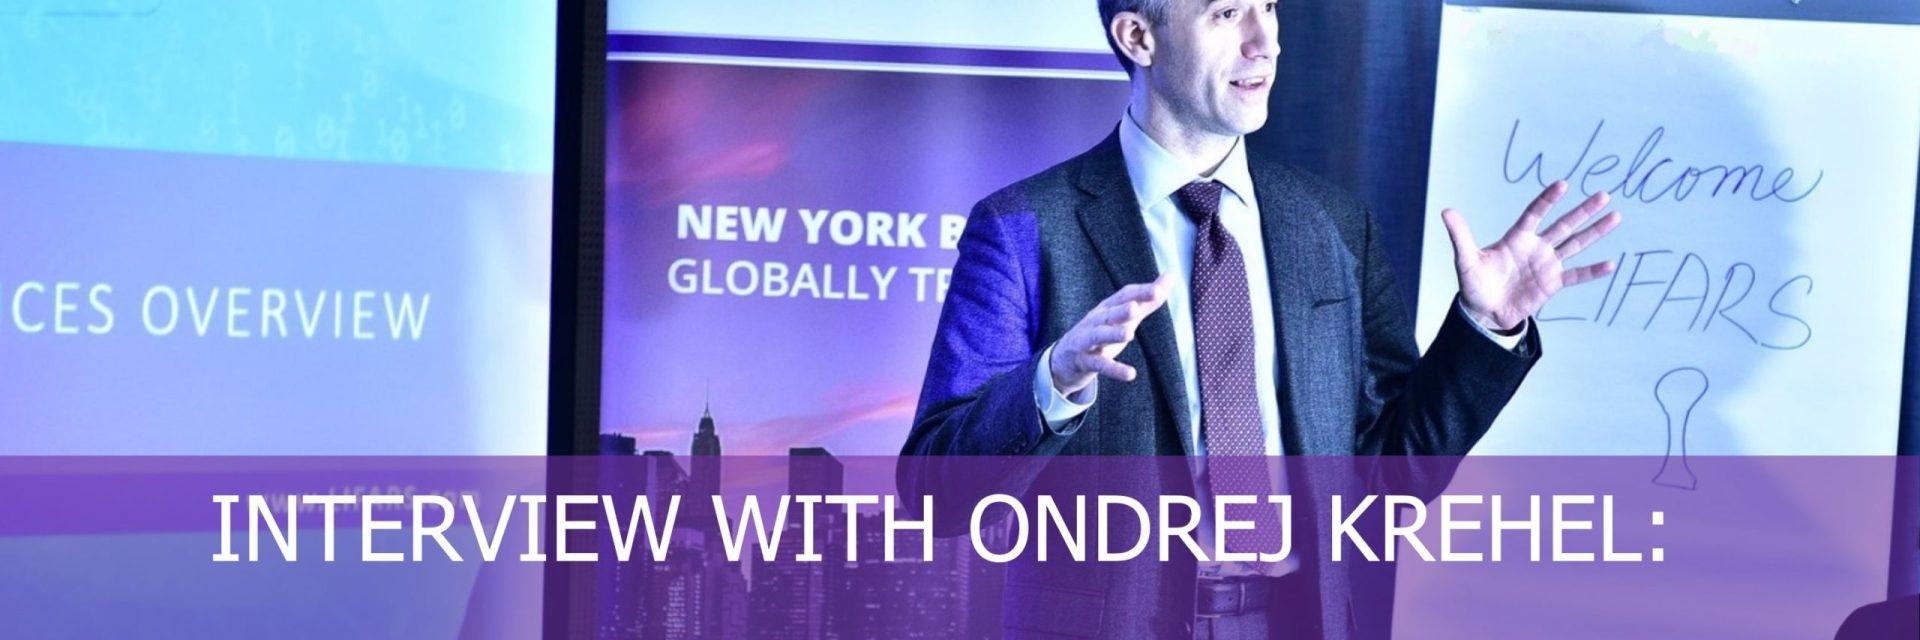 Interview With Ondrej Krehel Part 4